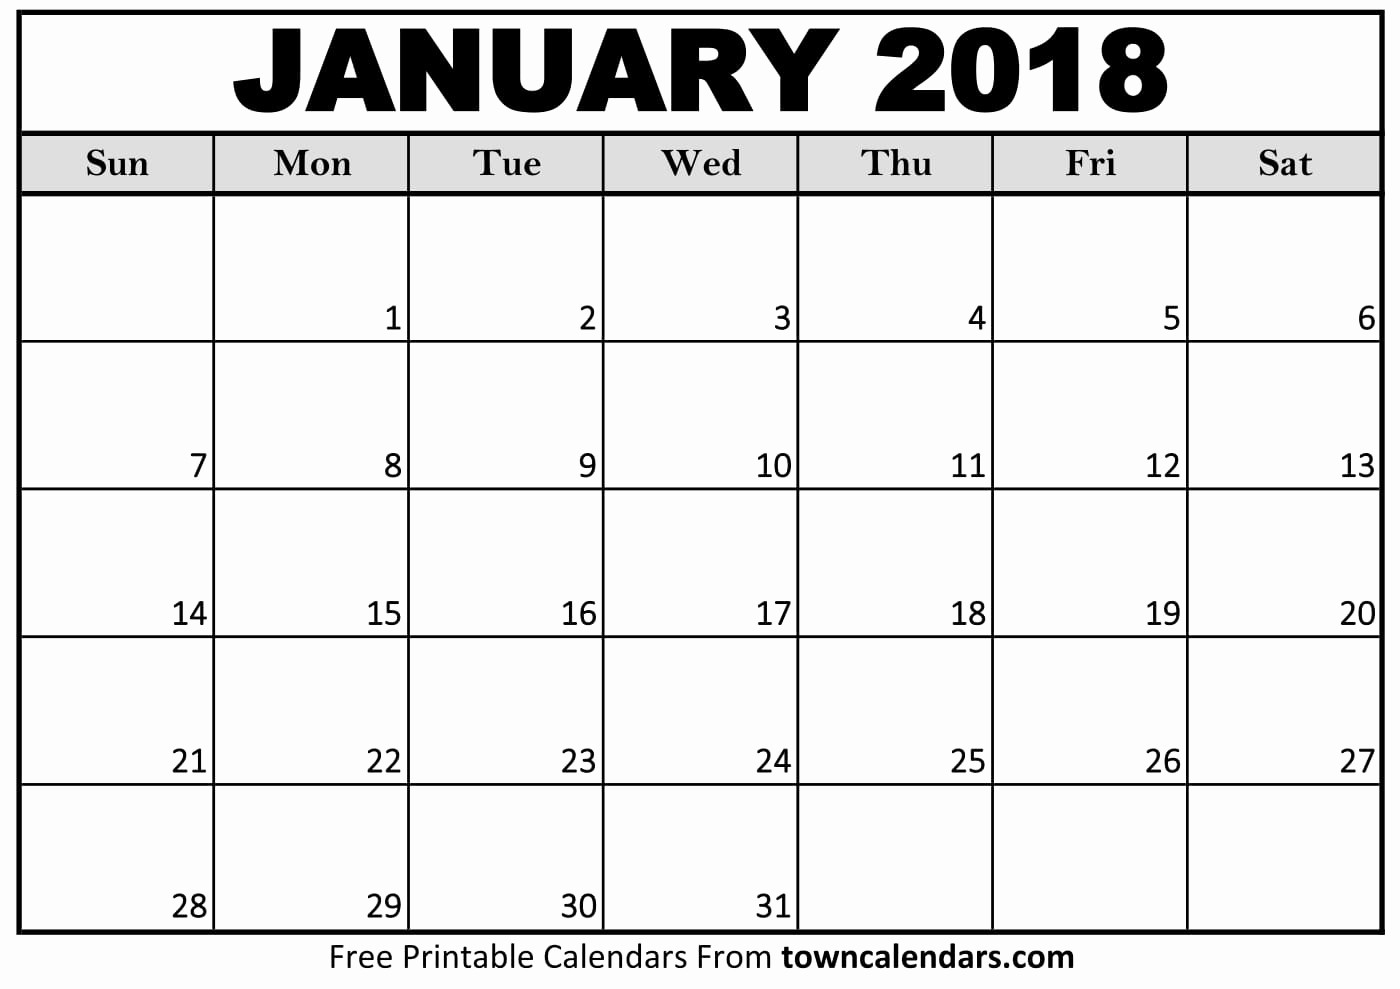 Free Printable 2018 Calendar Templates Unique Printable January 2018 Calendar towncalendars